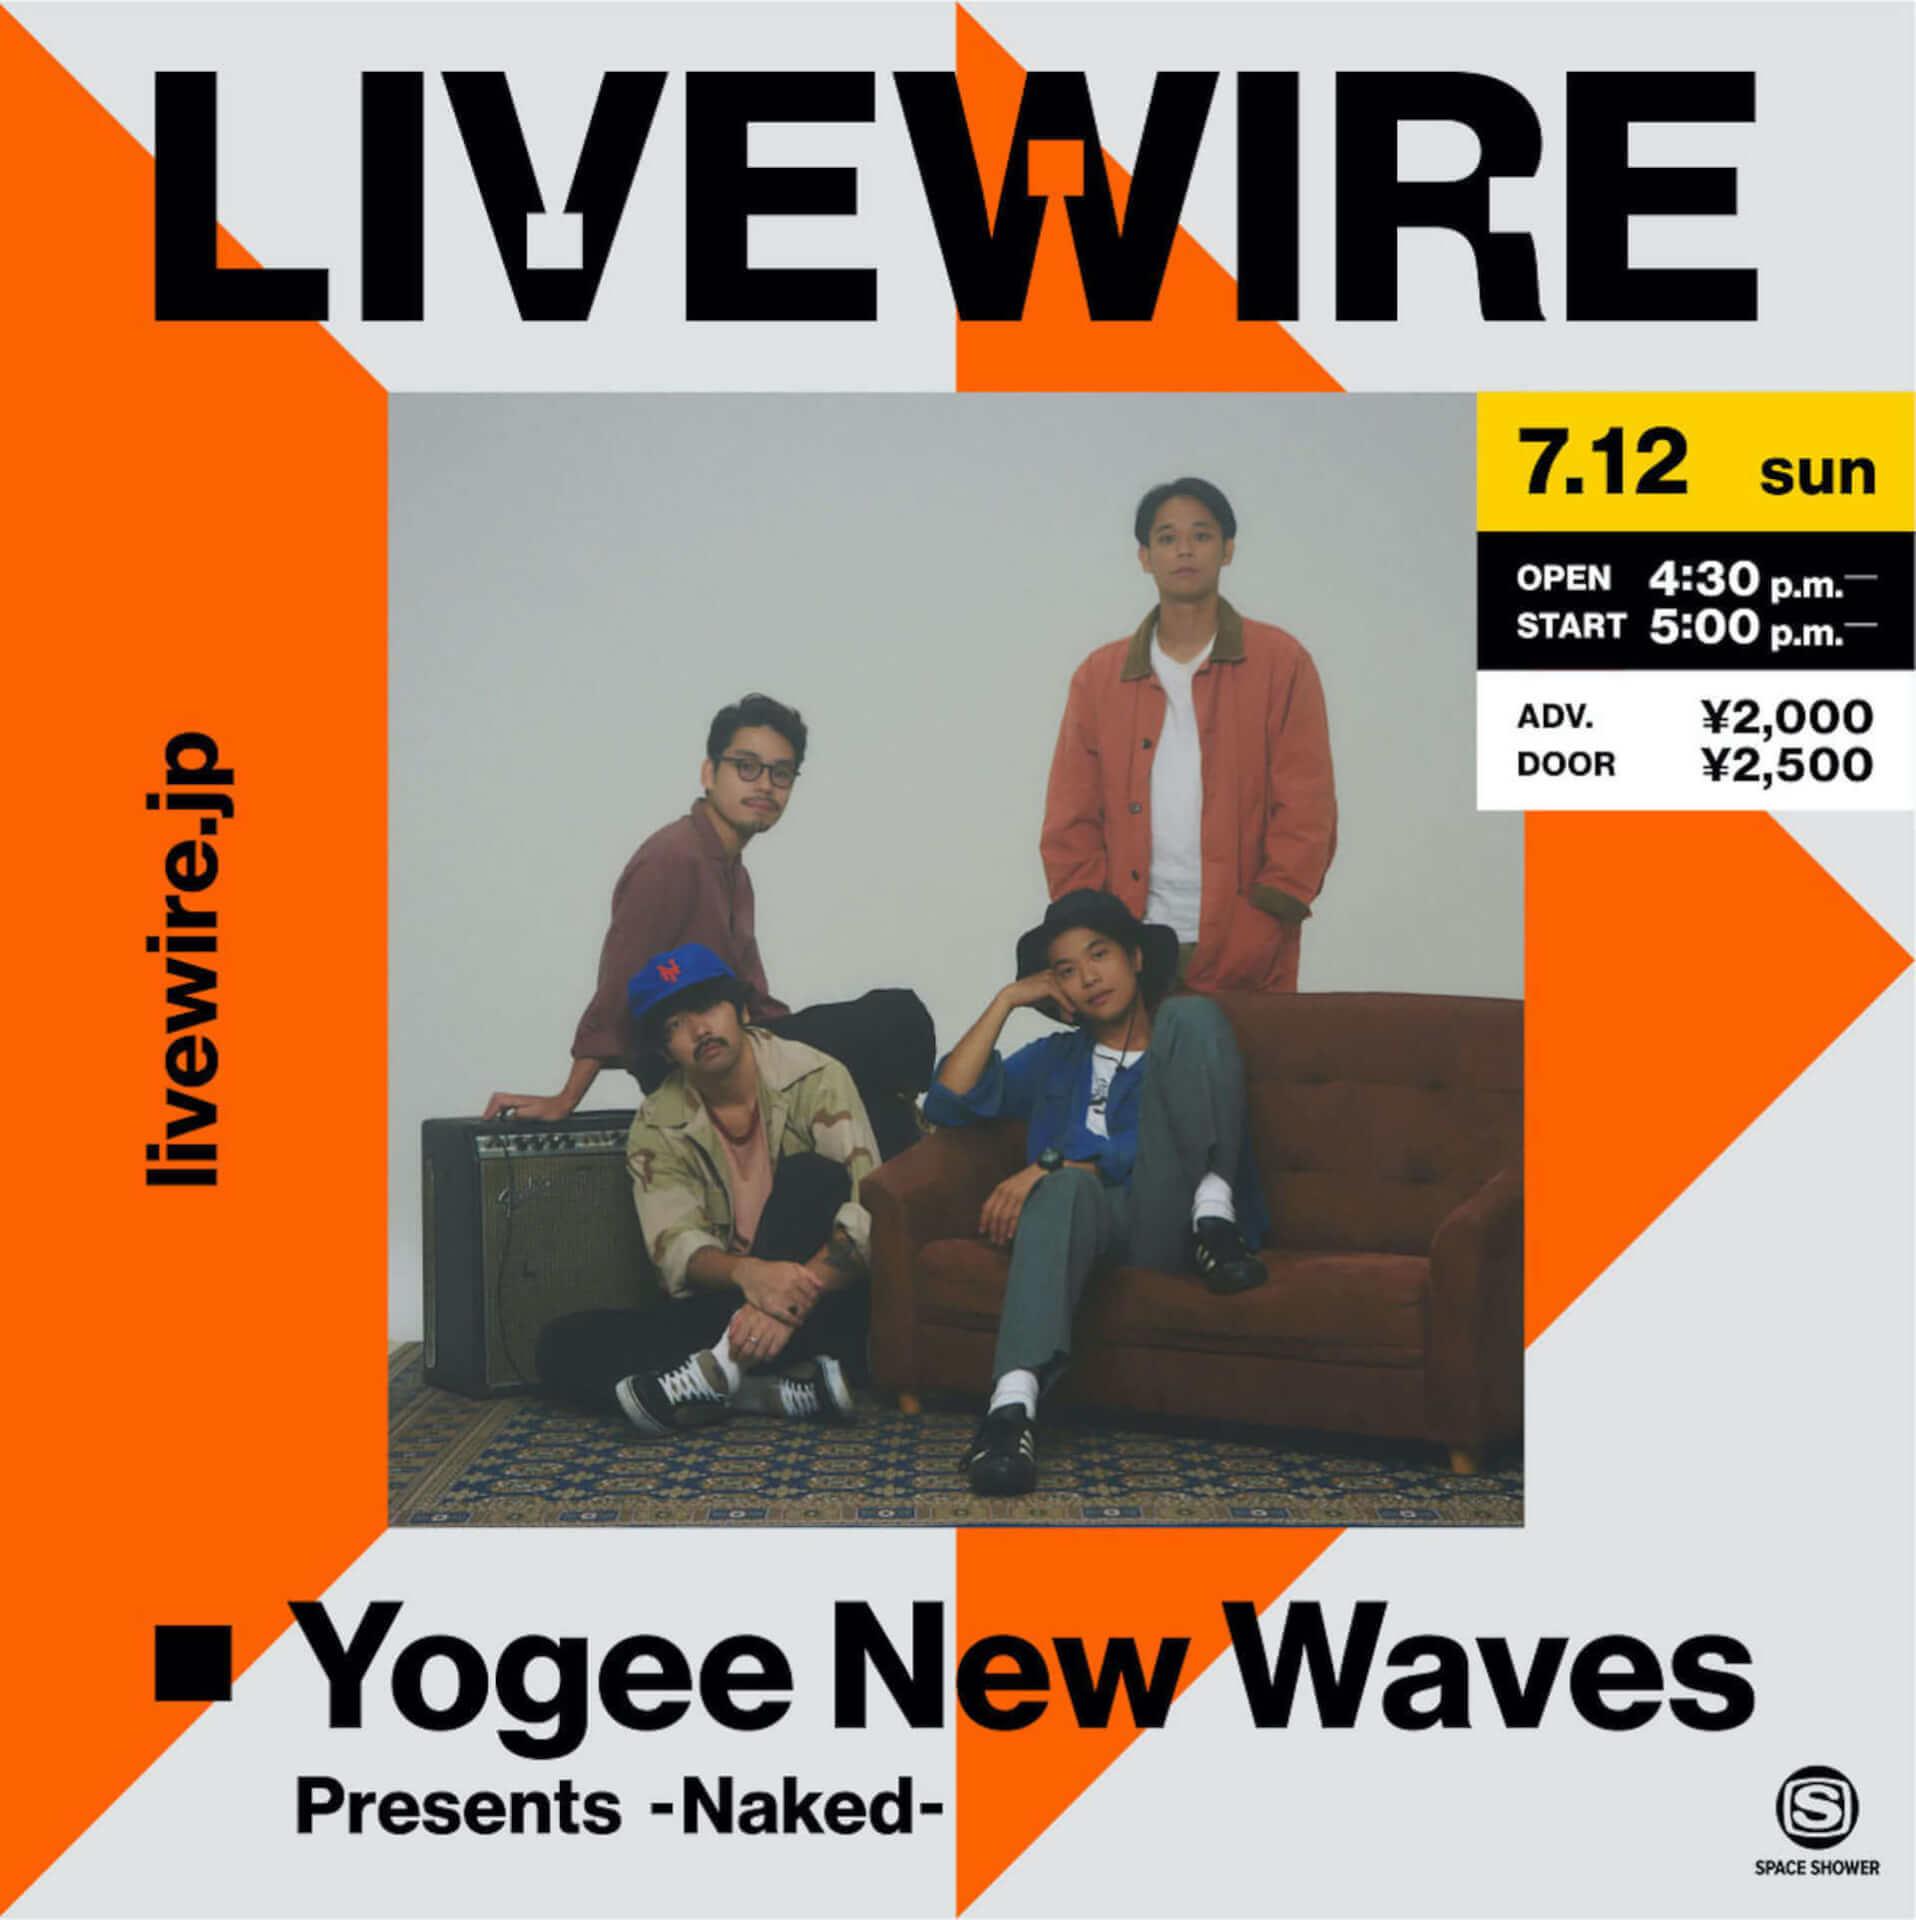 LIVEWIREで配信されたYogee New Wavesのライブ映像が期間限定で見逃し配信中!ライブレポートも到着 music200714_livewire_yogeenewwaves_01